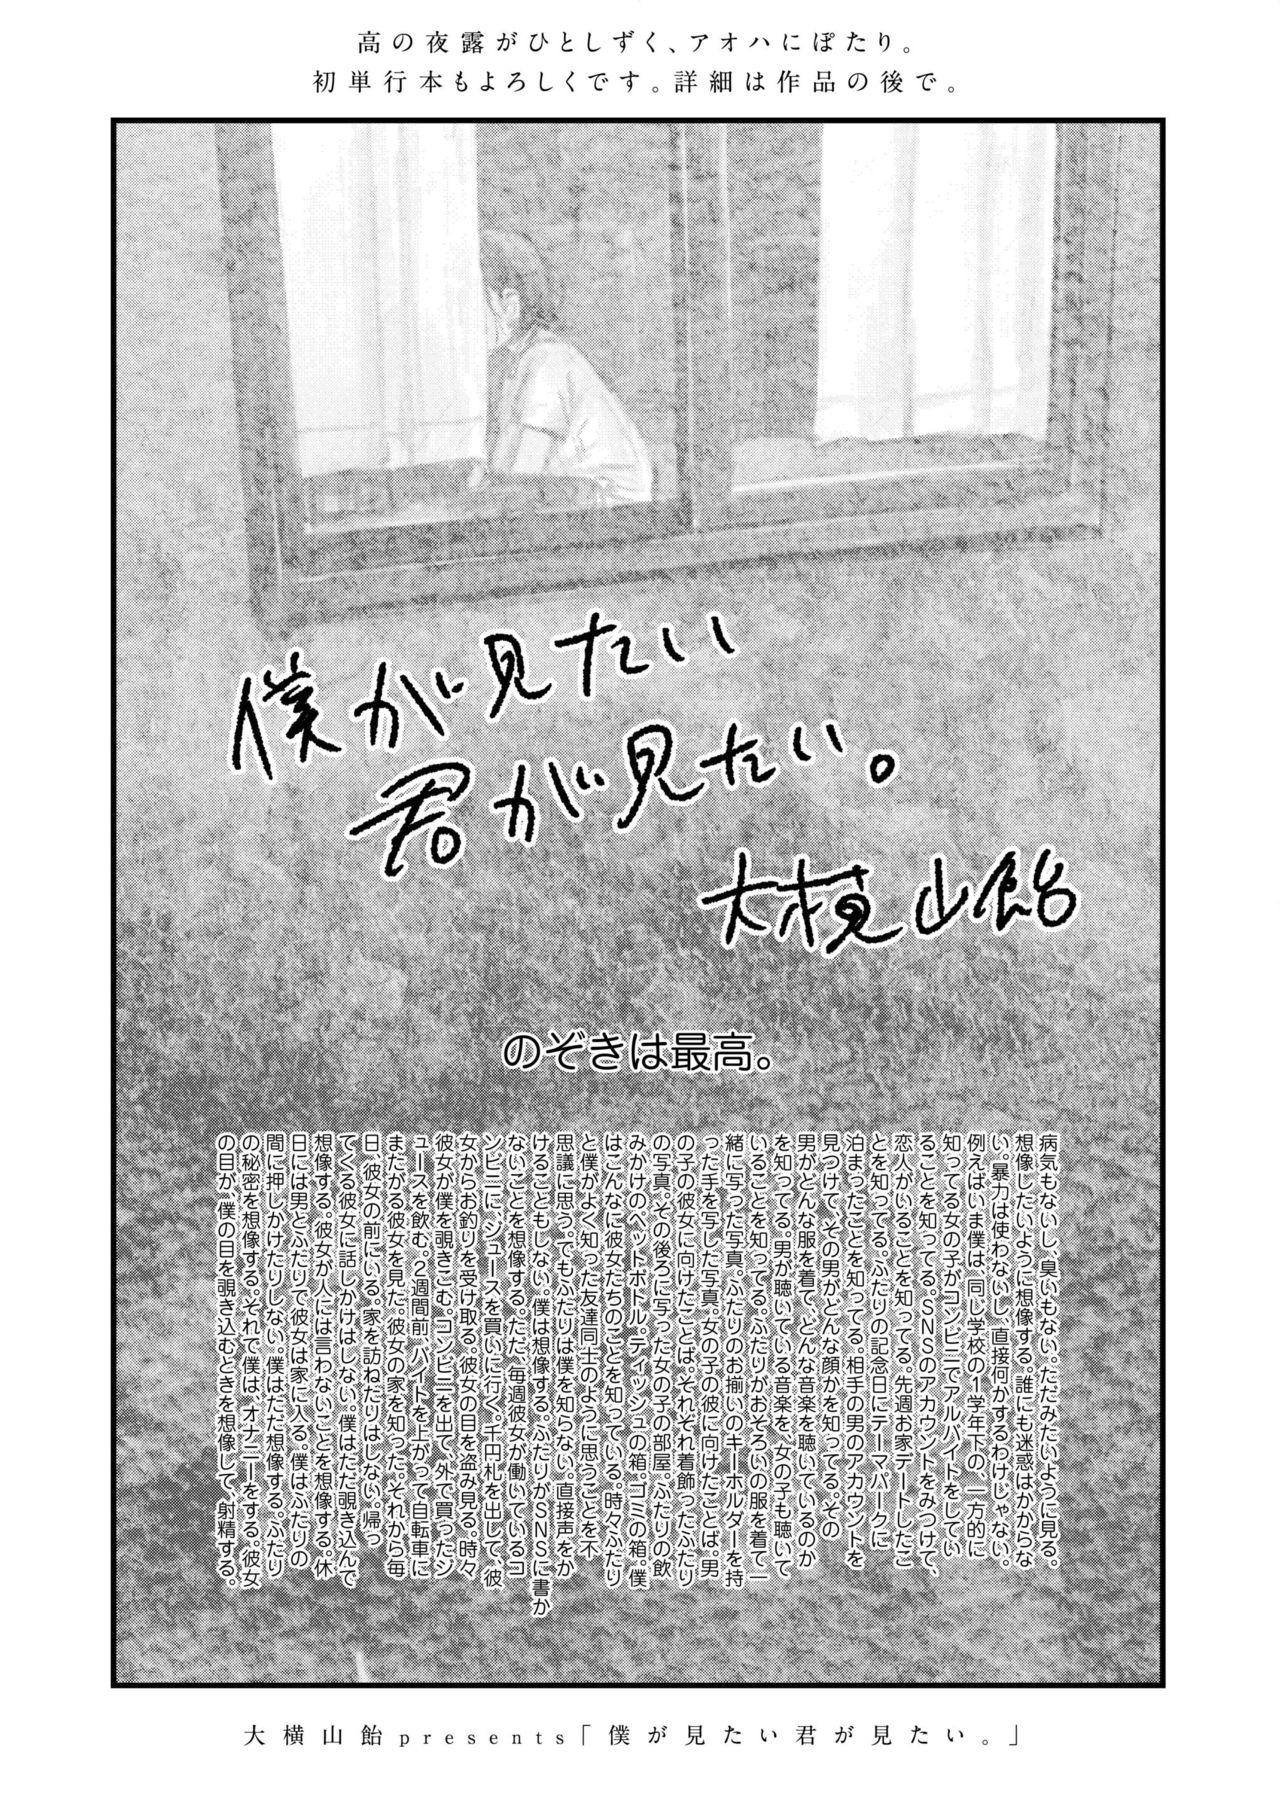 COMIC AOHA 2019 Haru 376